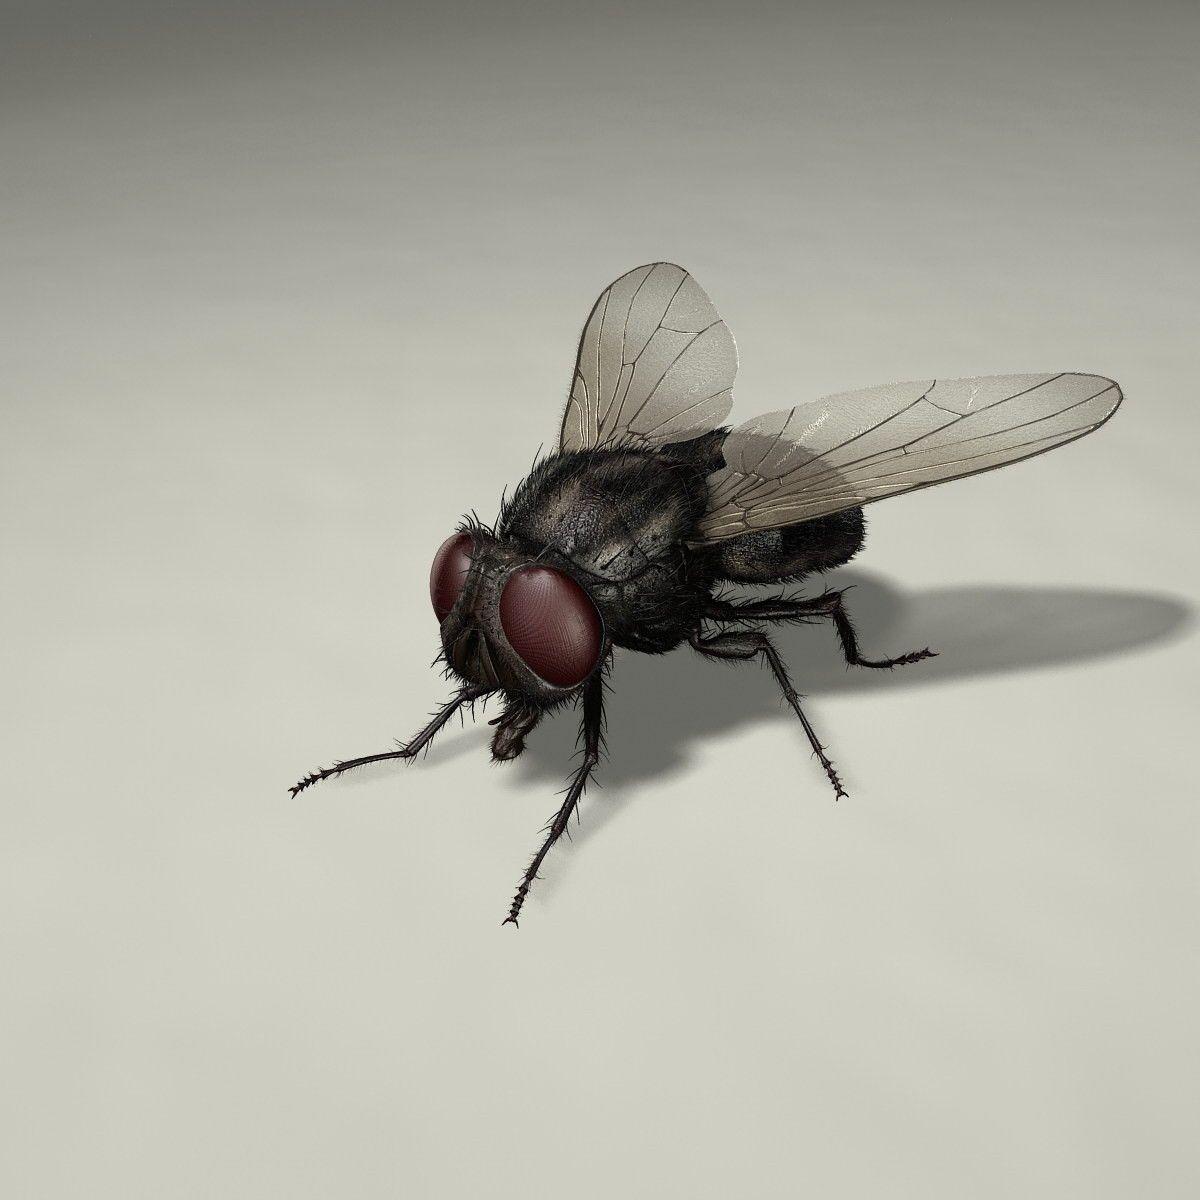 maya housefly animation   3D Malen   Pinterest   Maya, Animation and ...